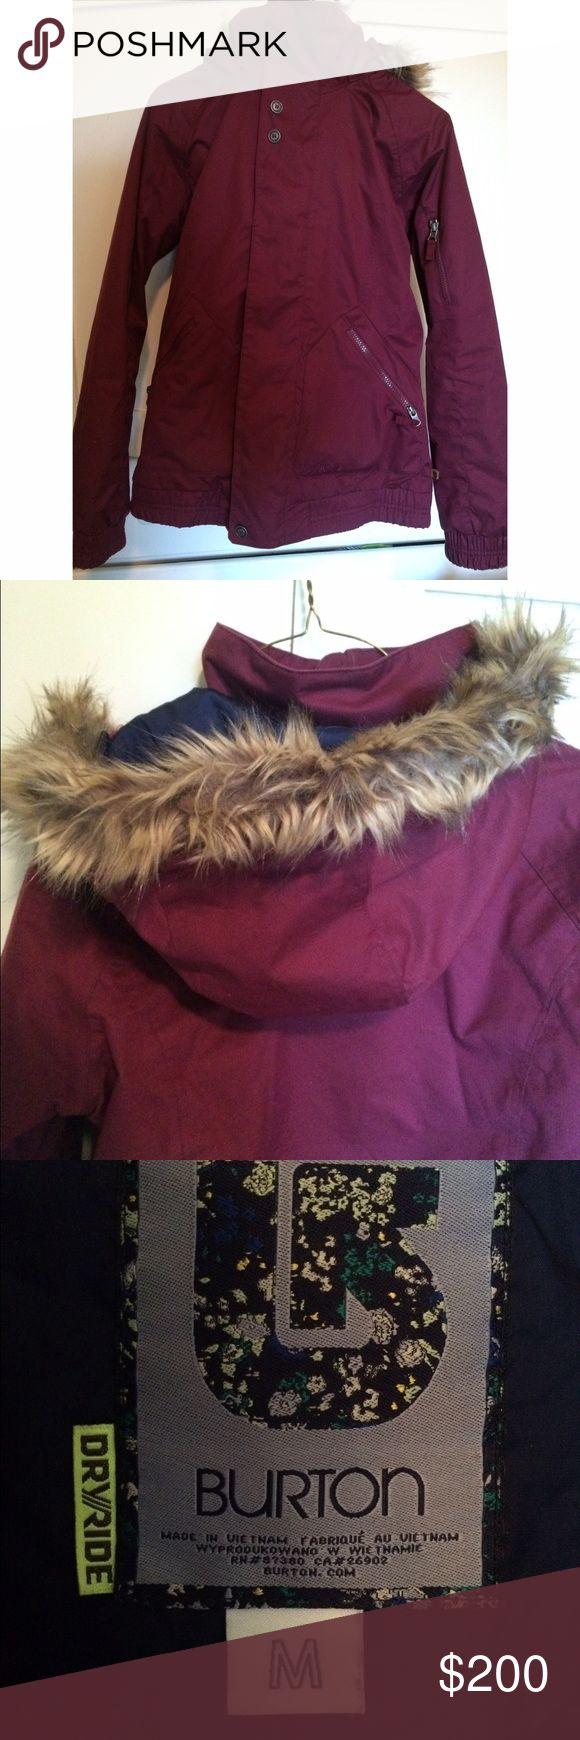 Women's burton ski jacket Maroon, women's ski jacket with detachable fur hood. Perfect condition Burton Jackets & Coats